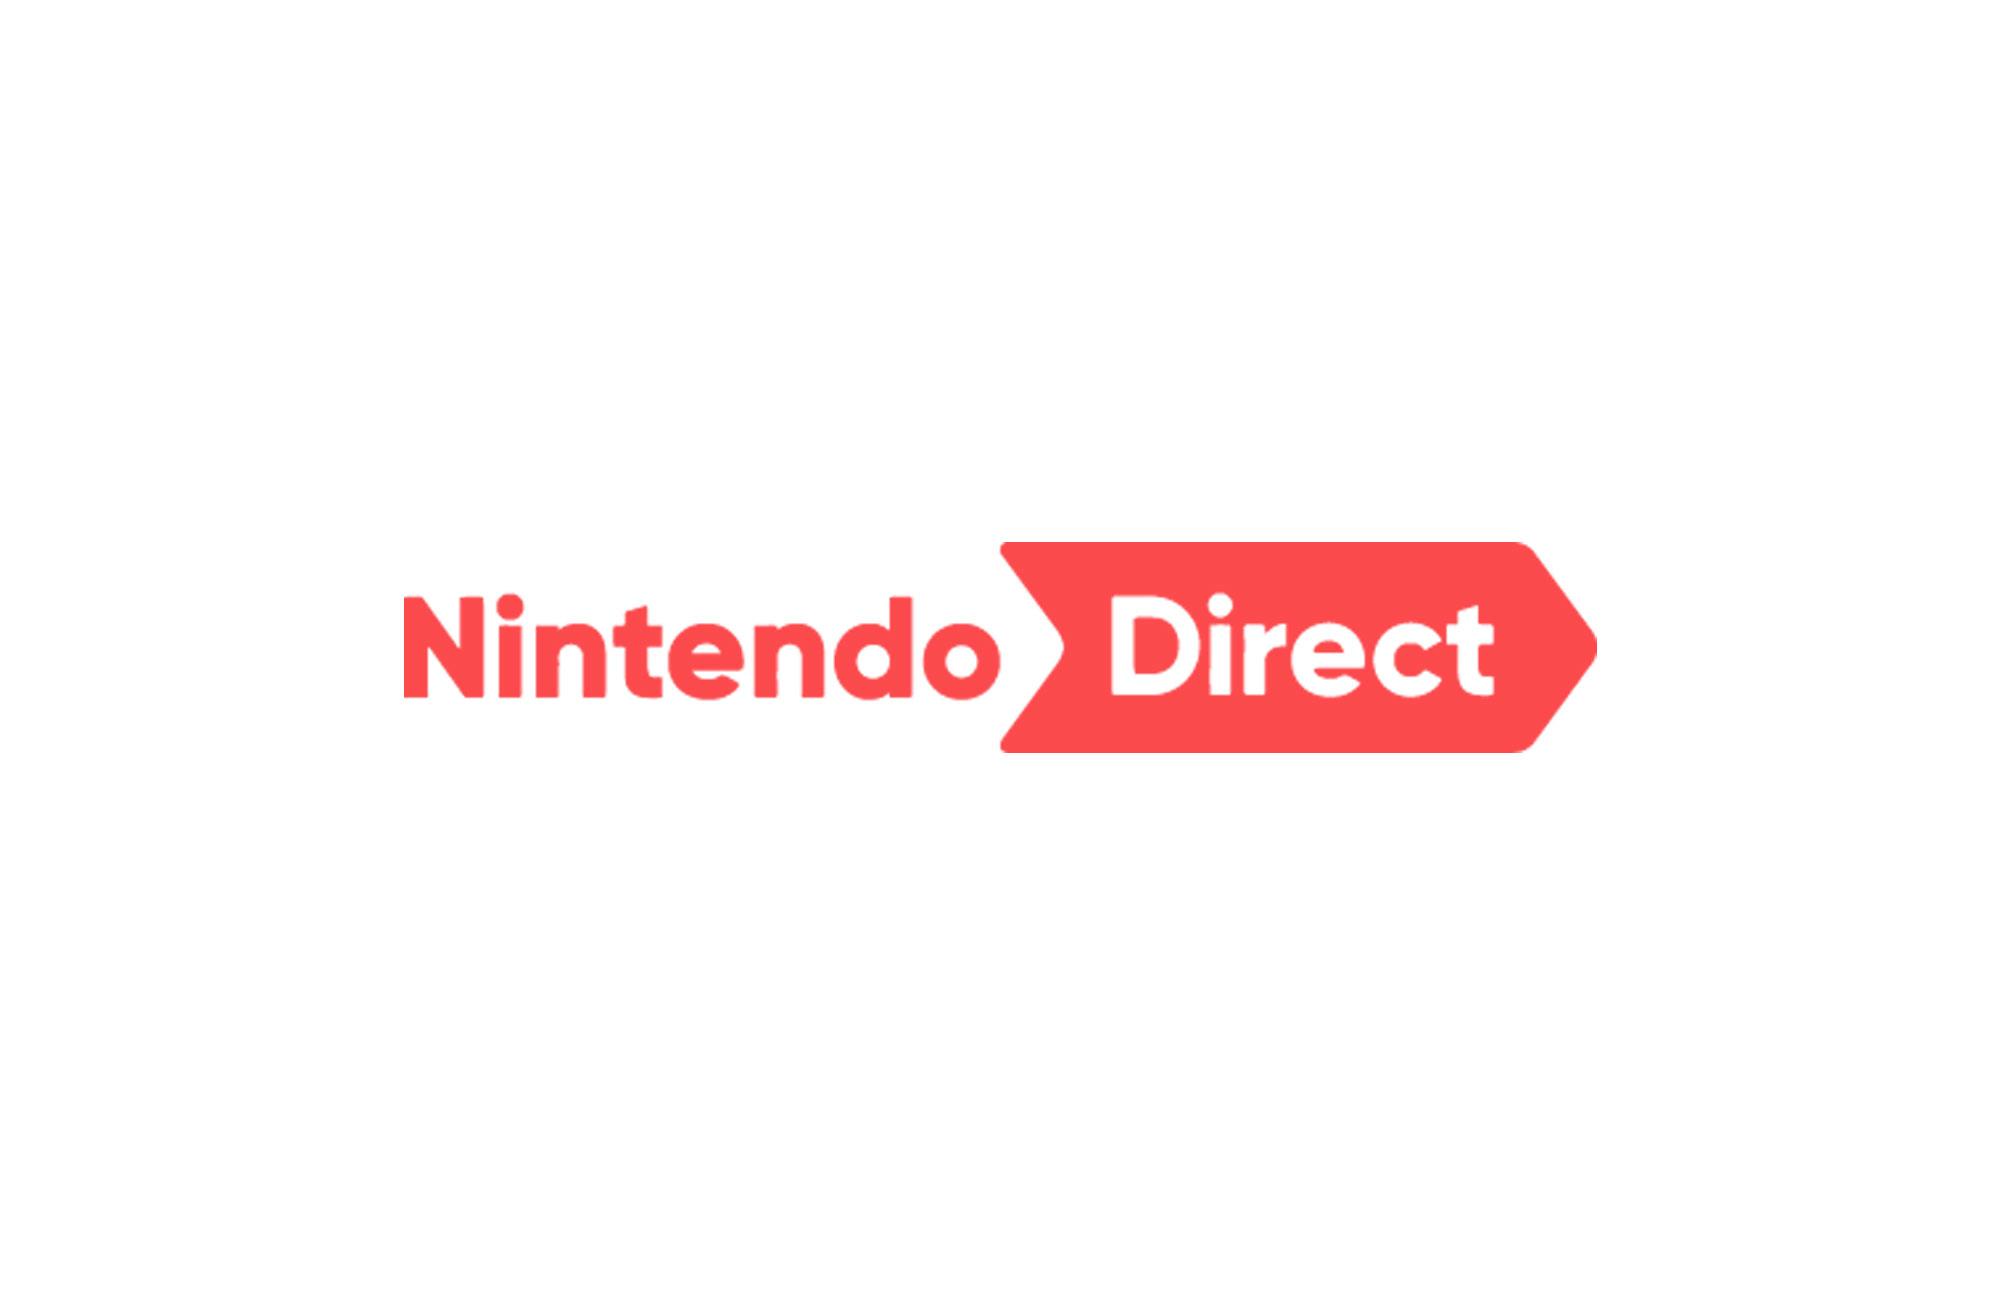 Nintendo Direct - Feature Image